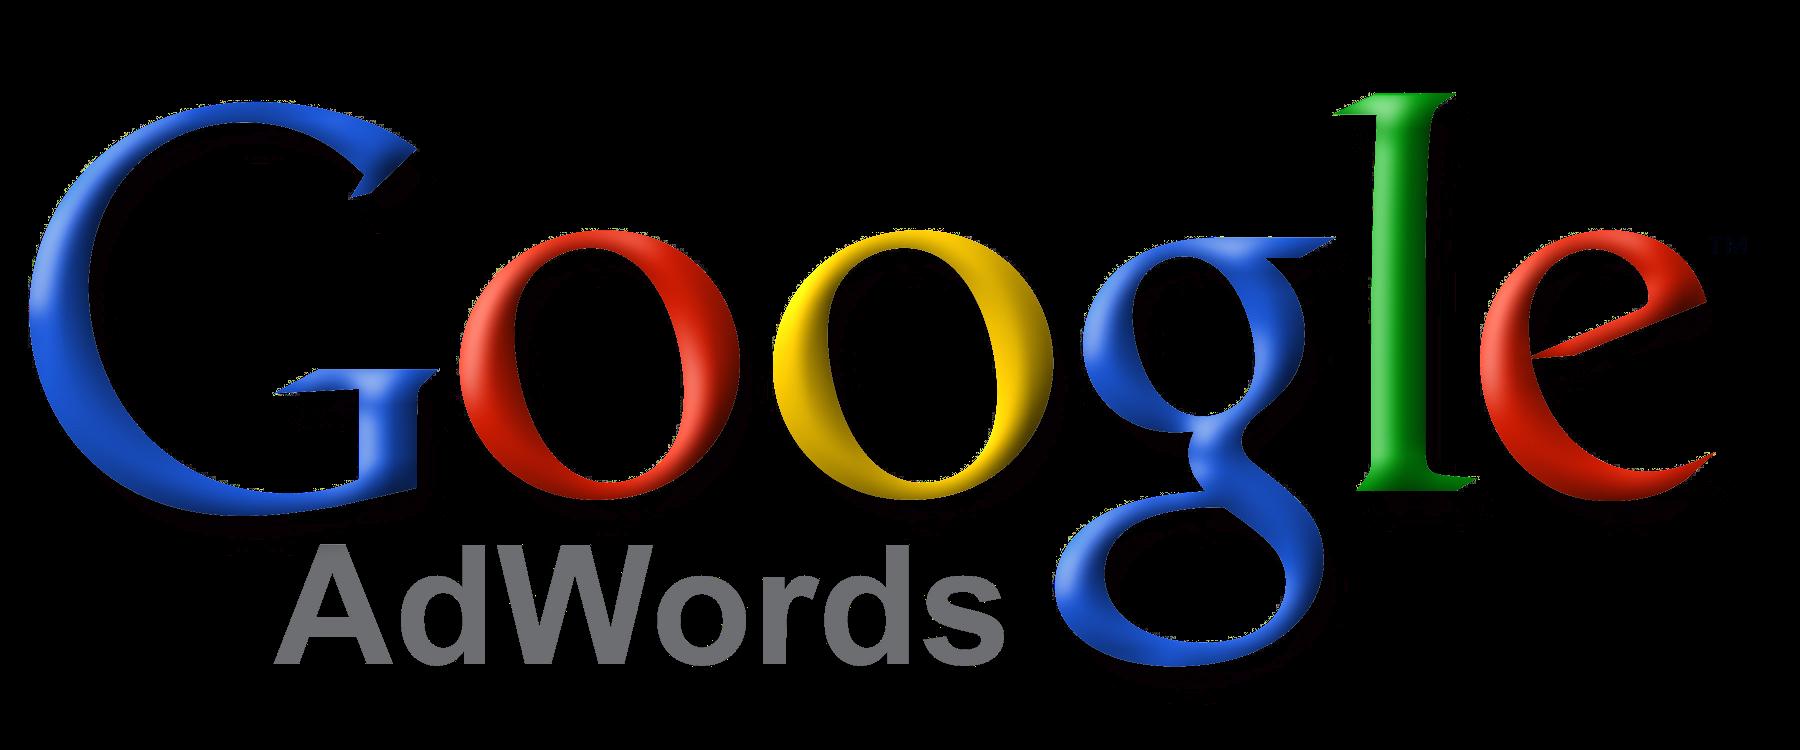 File:logo Google Adwords.png - Google Adwords, Transparent background PNG HD thumbnail